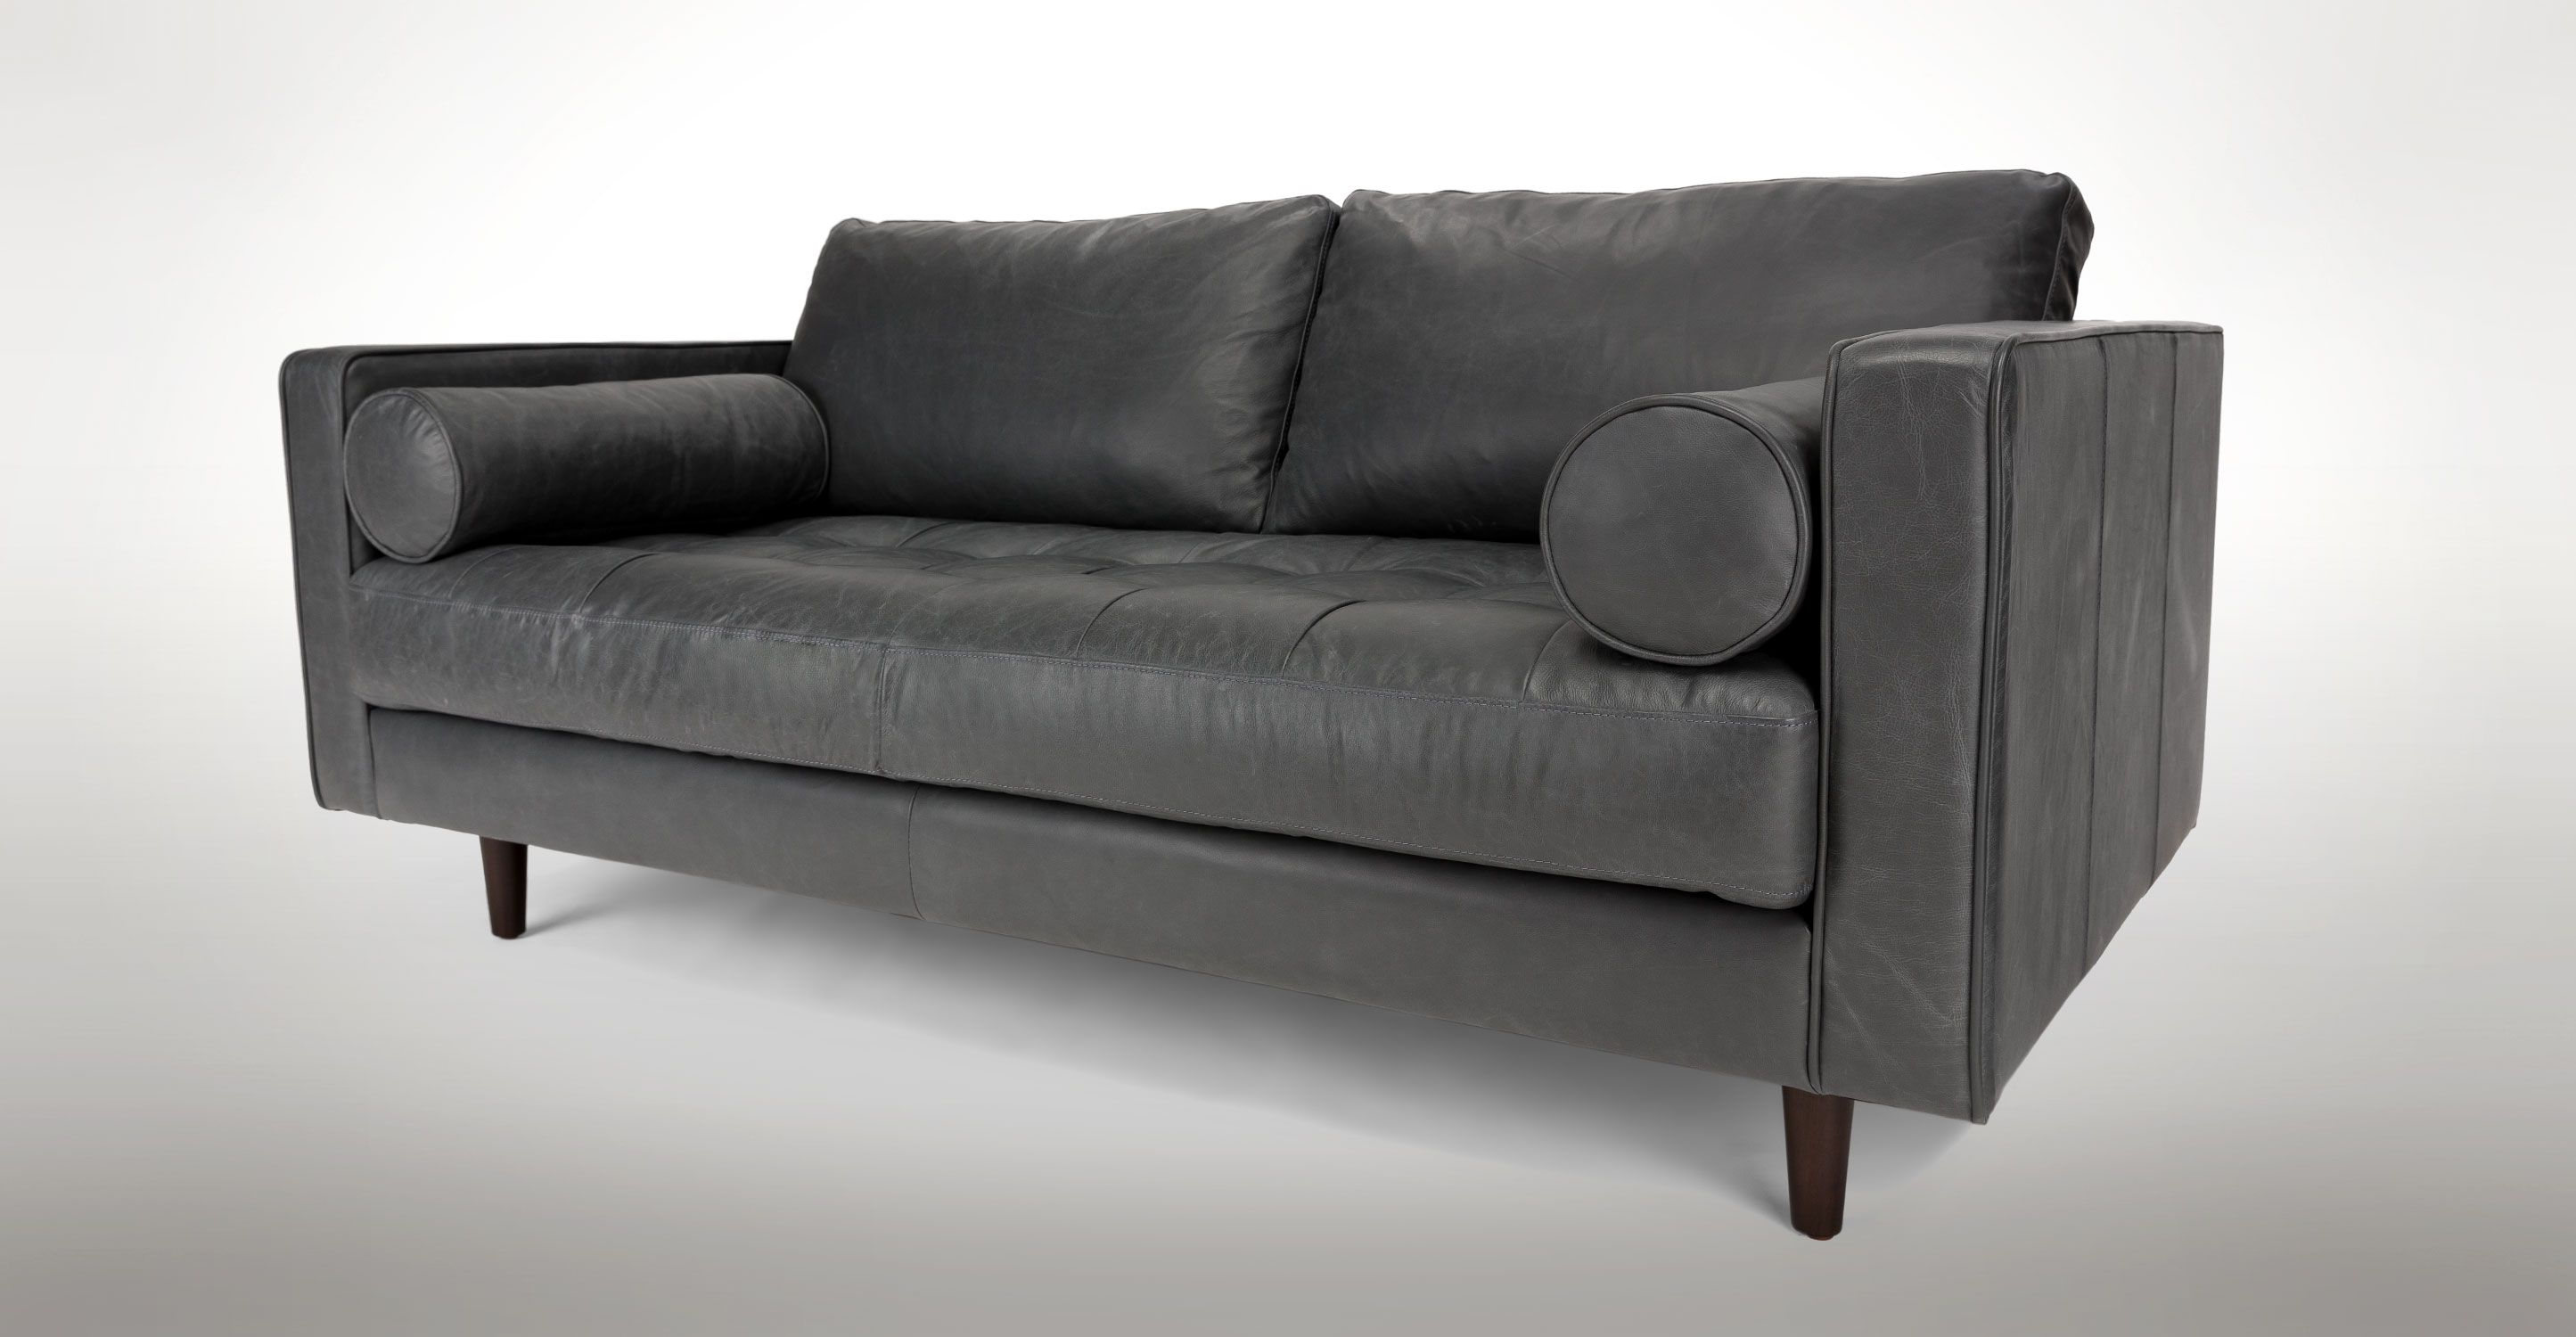 Surprising Gray Leather Tufted Sofa Upholstered Article Sven Modern Ibusinesslaw Wood Chair Design Ideas Ibusinesslaworg